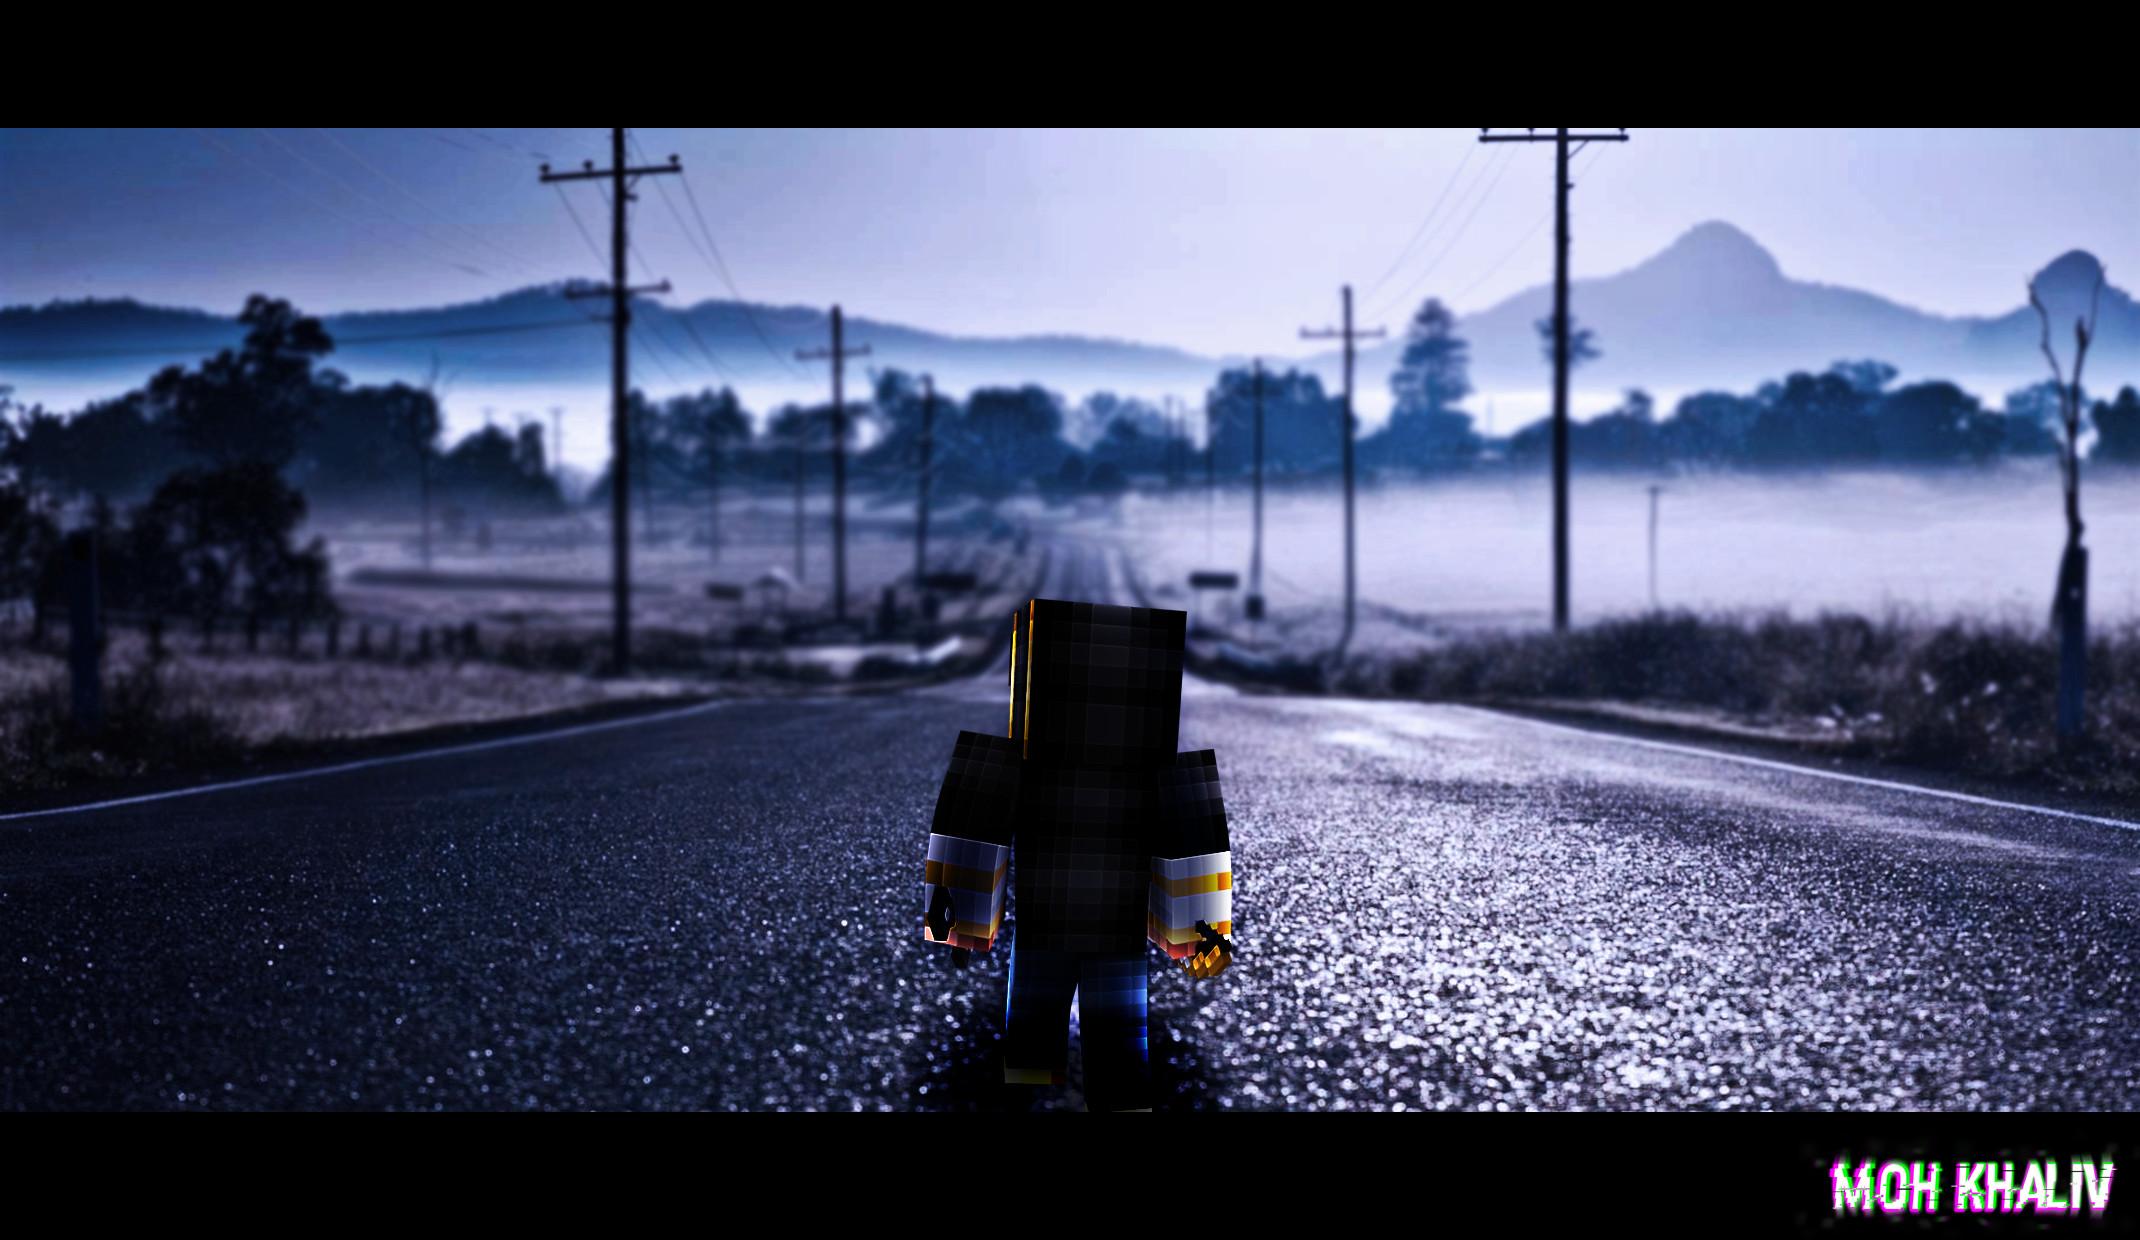 Most Inspiring Wallpaper Minecraft Real Life - 609486  Pic_92806.jpg